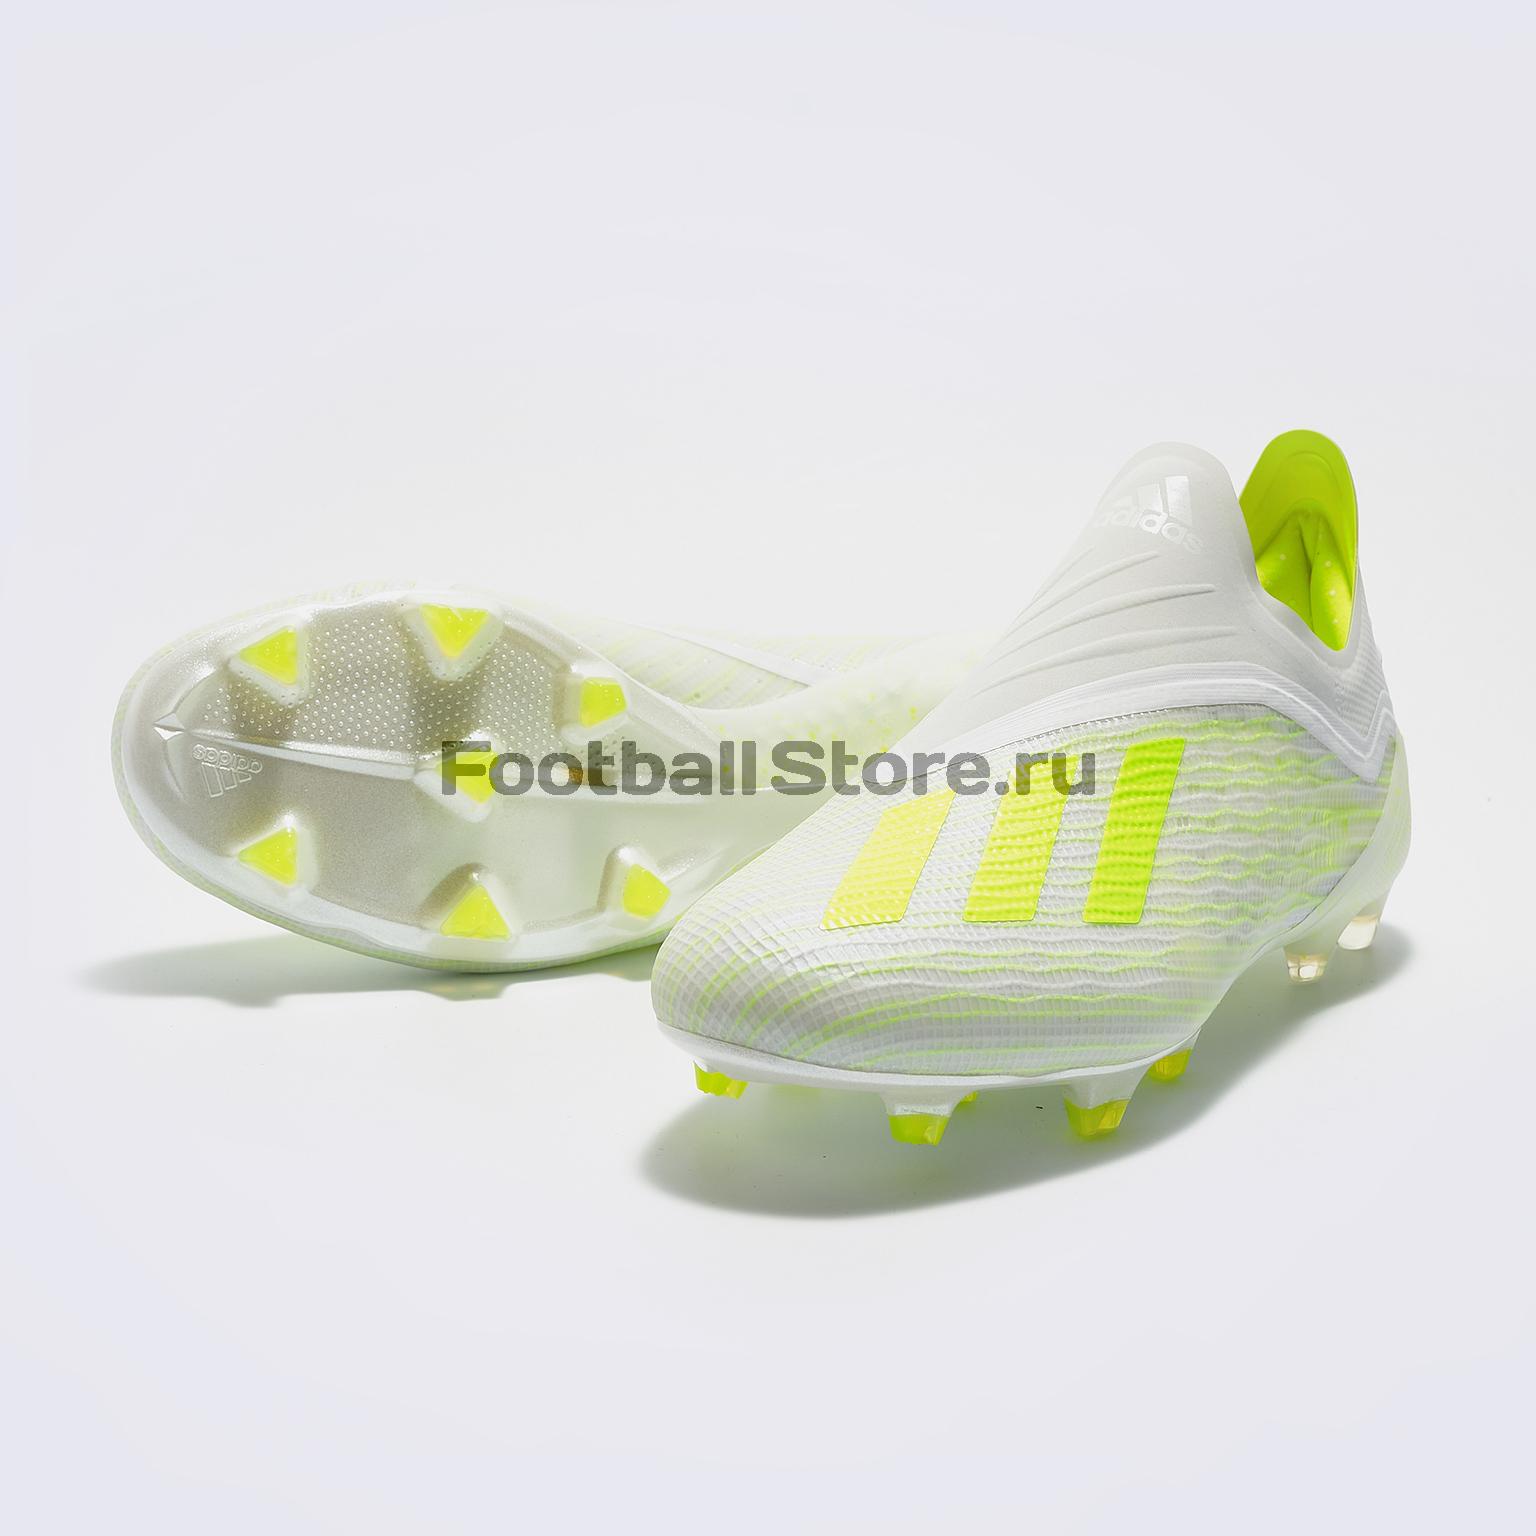 Бутсы Adidas X 18+ FG BB9338